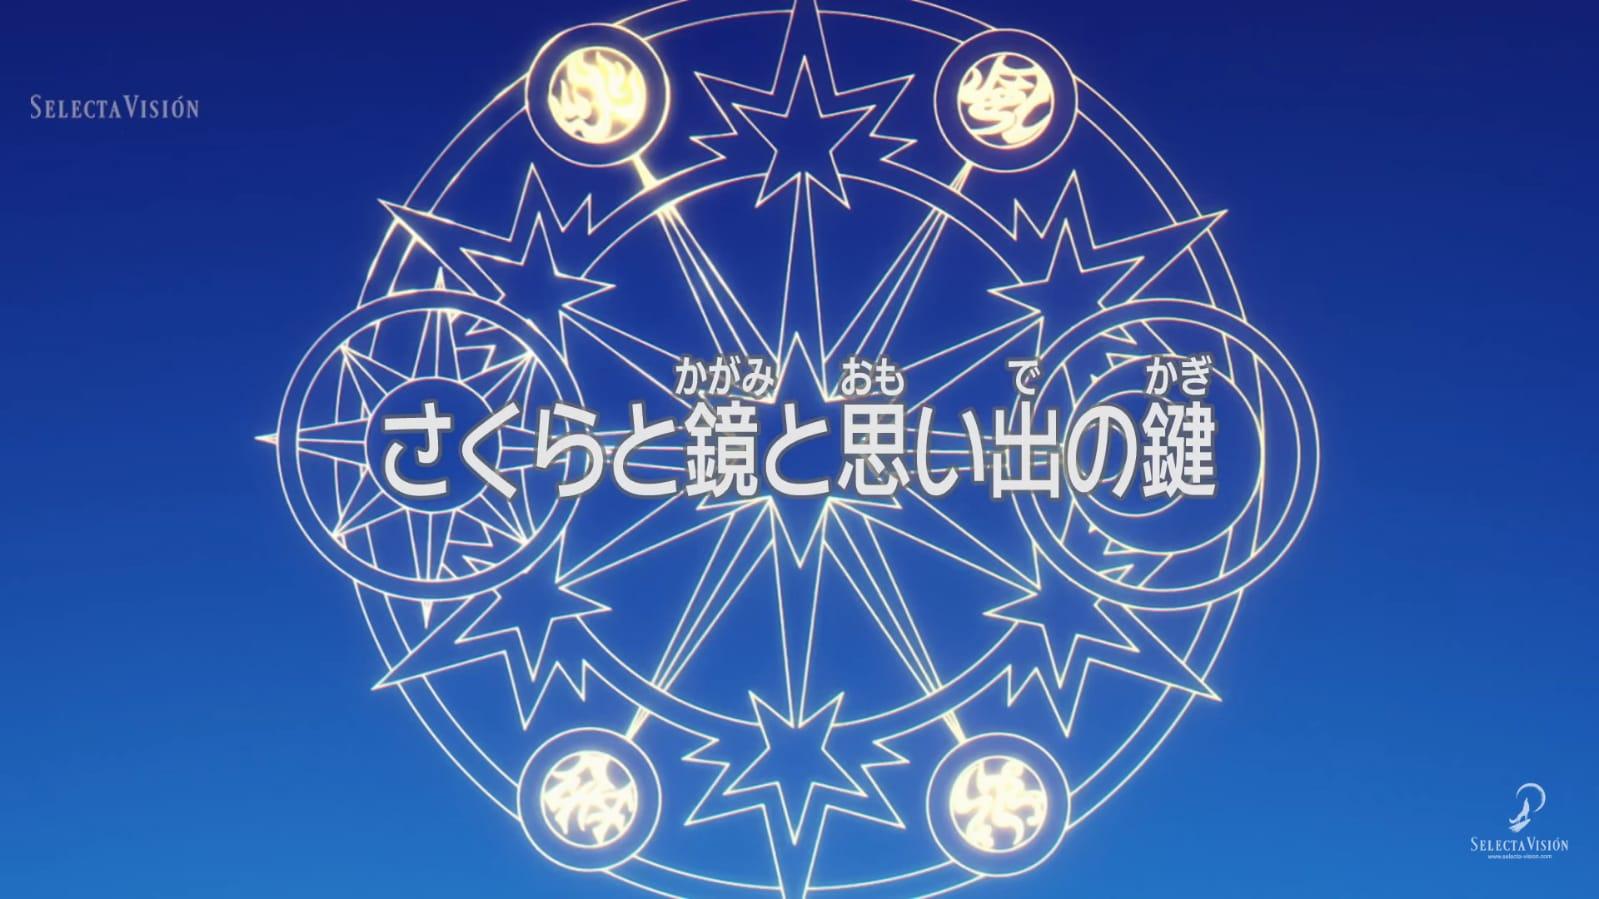 cardcaptor sakura clear card analisis episodio 21 Título